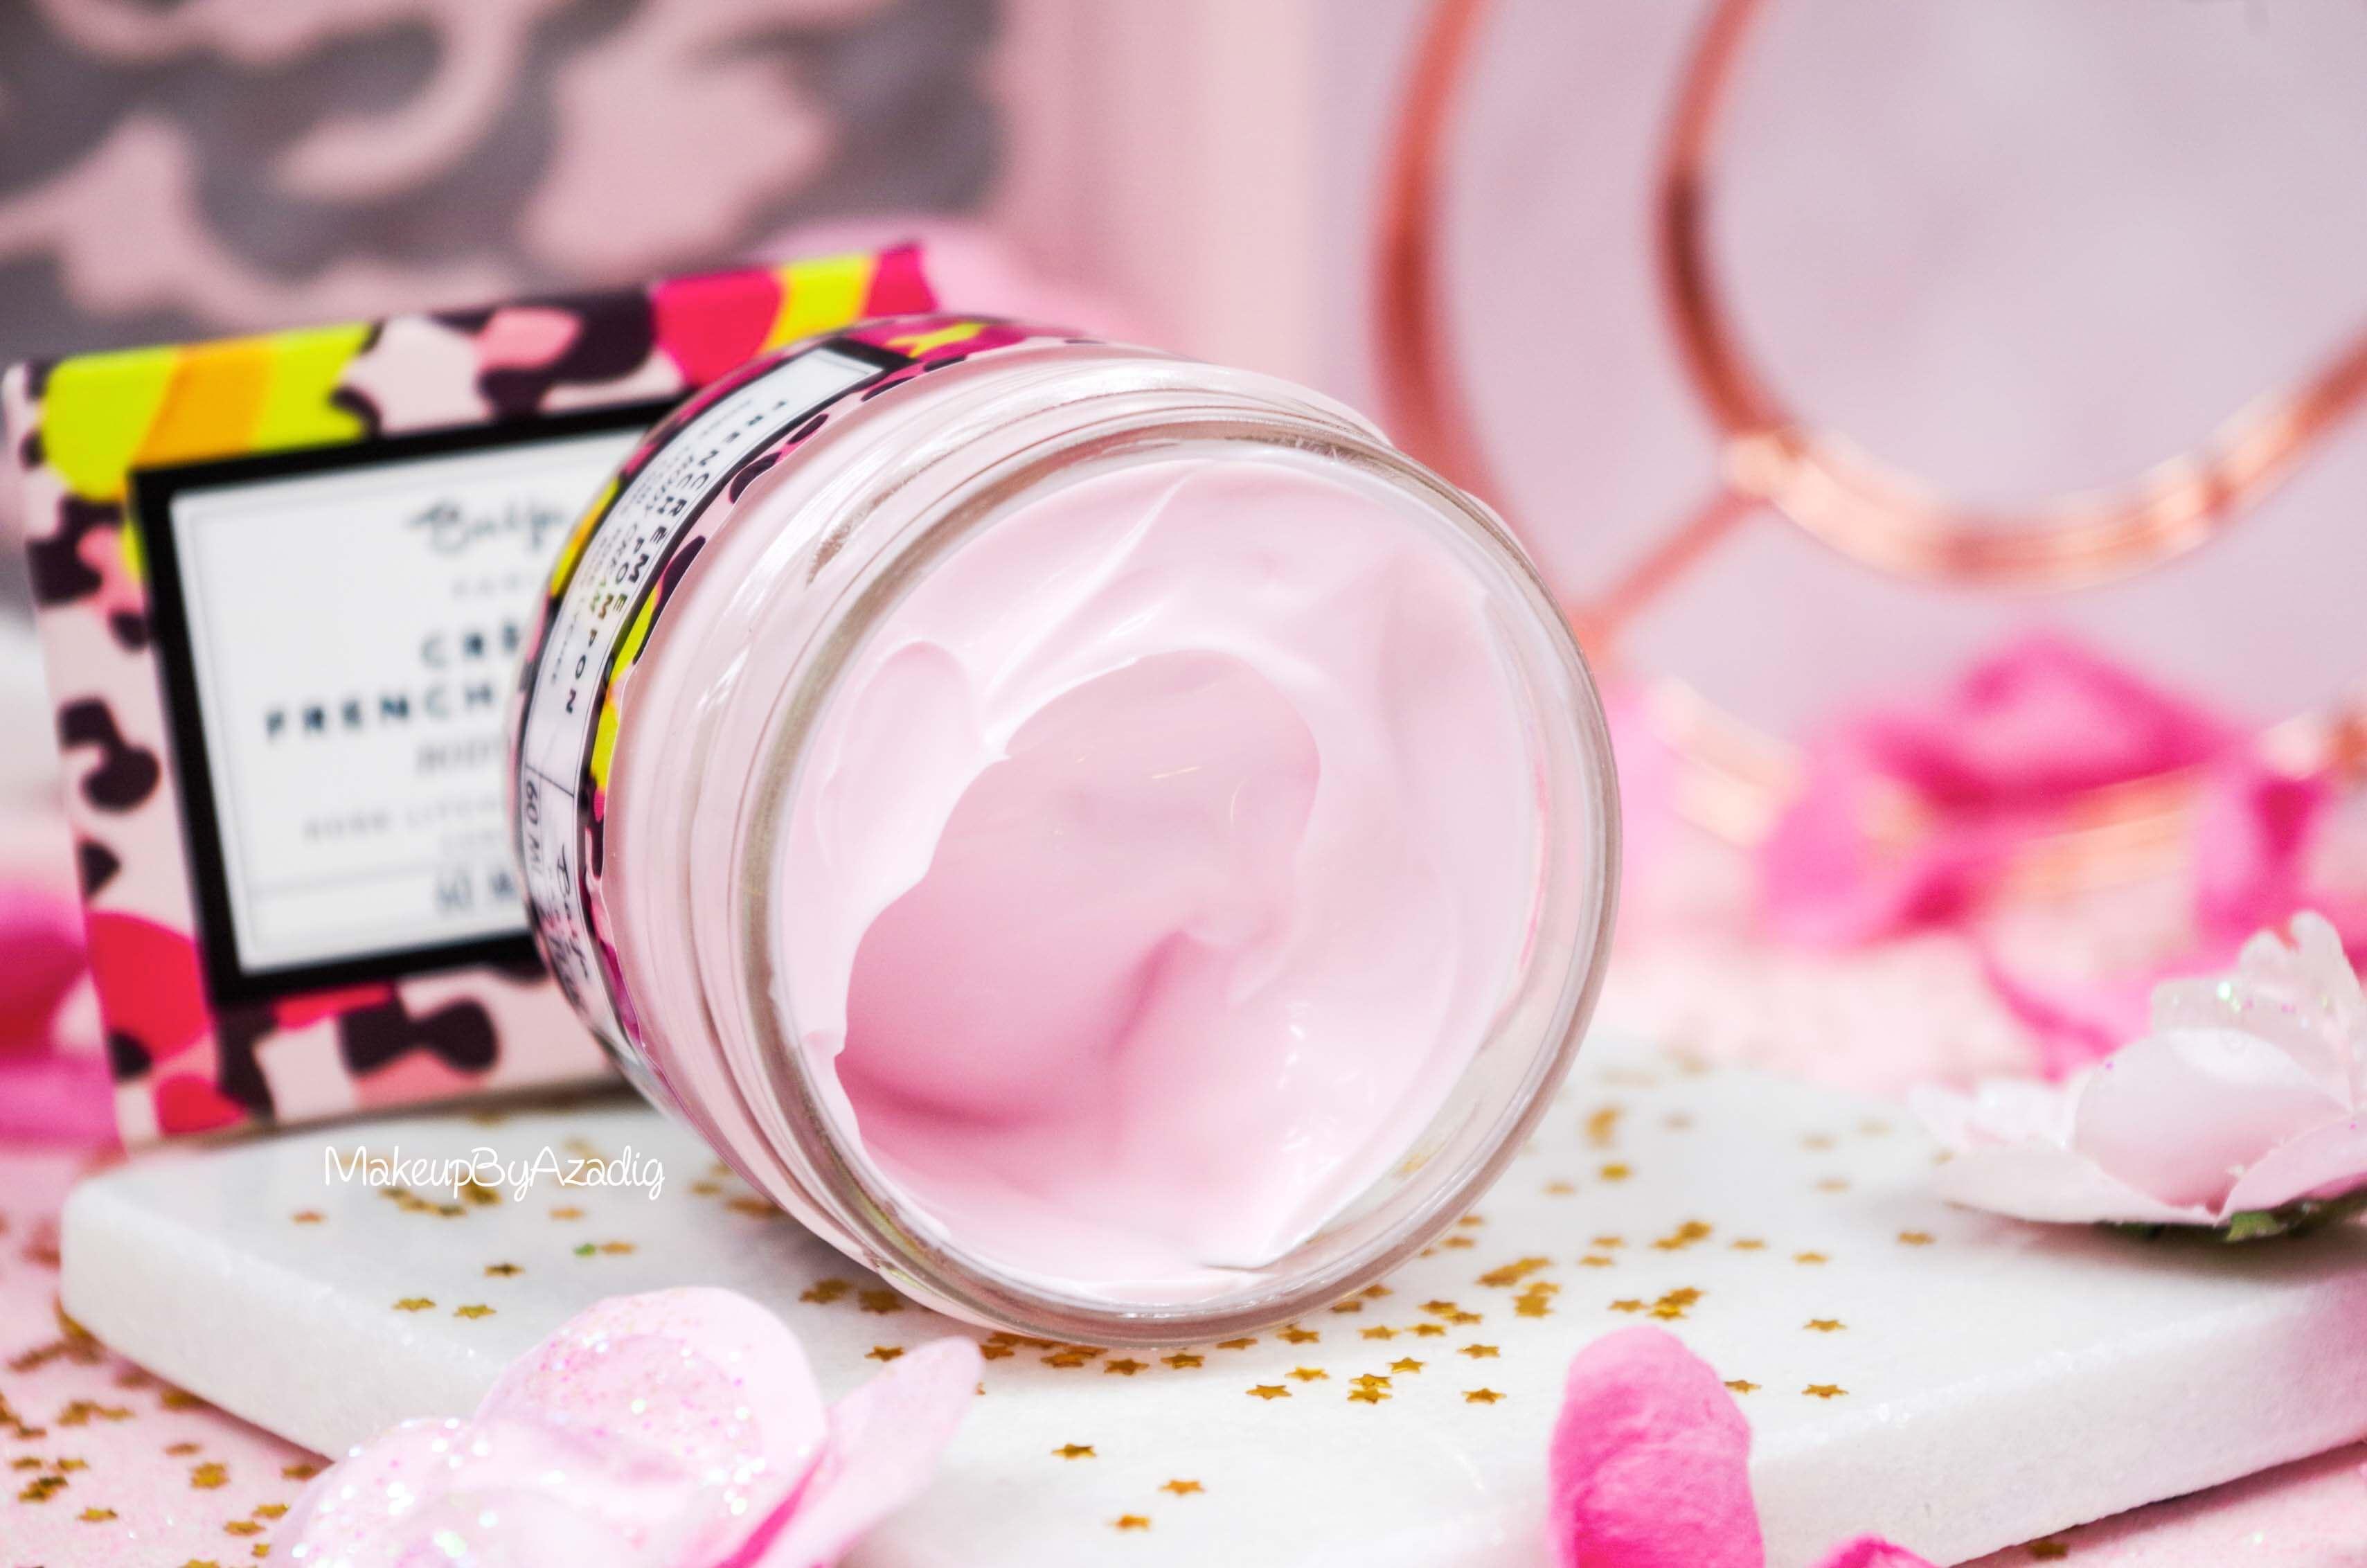 creme-corps-cream-body-french-pompon-baija-rose-litchi-sephora-makeupbyazadig-revue-prix-avis-onctueux